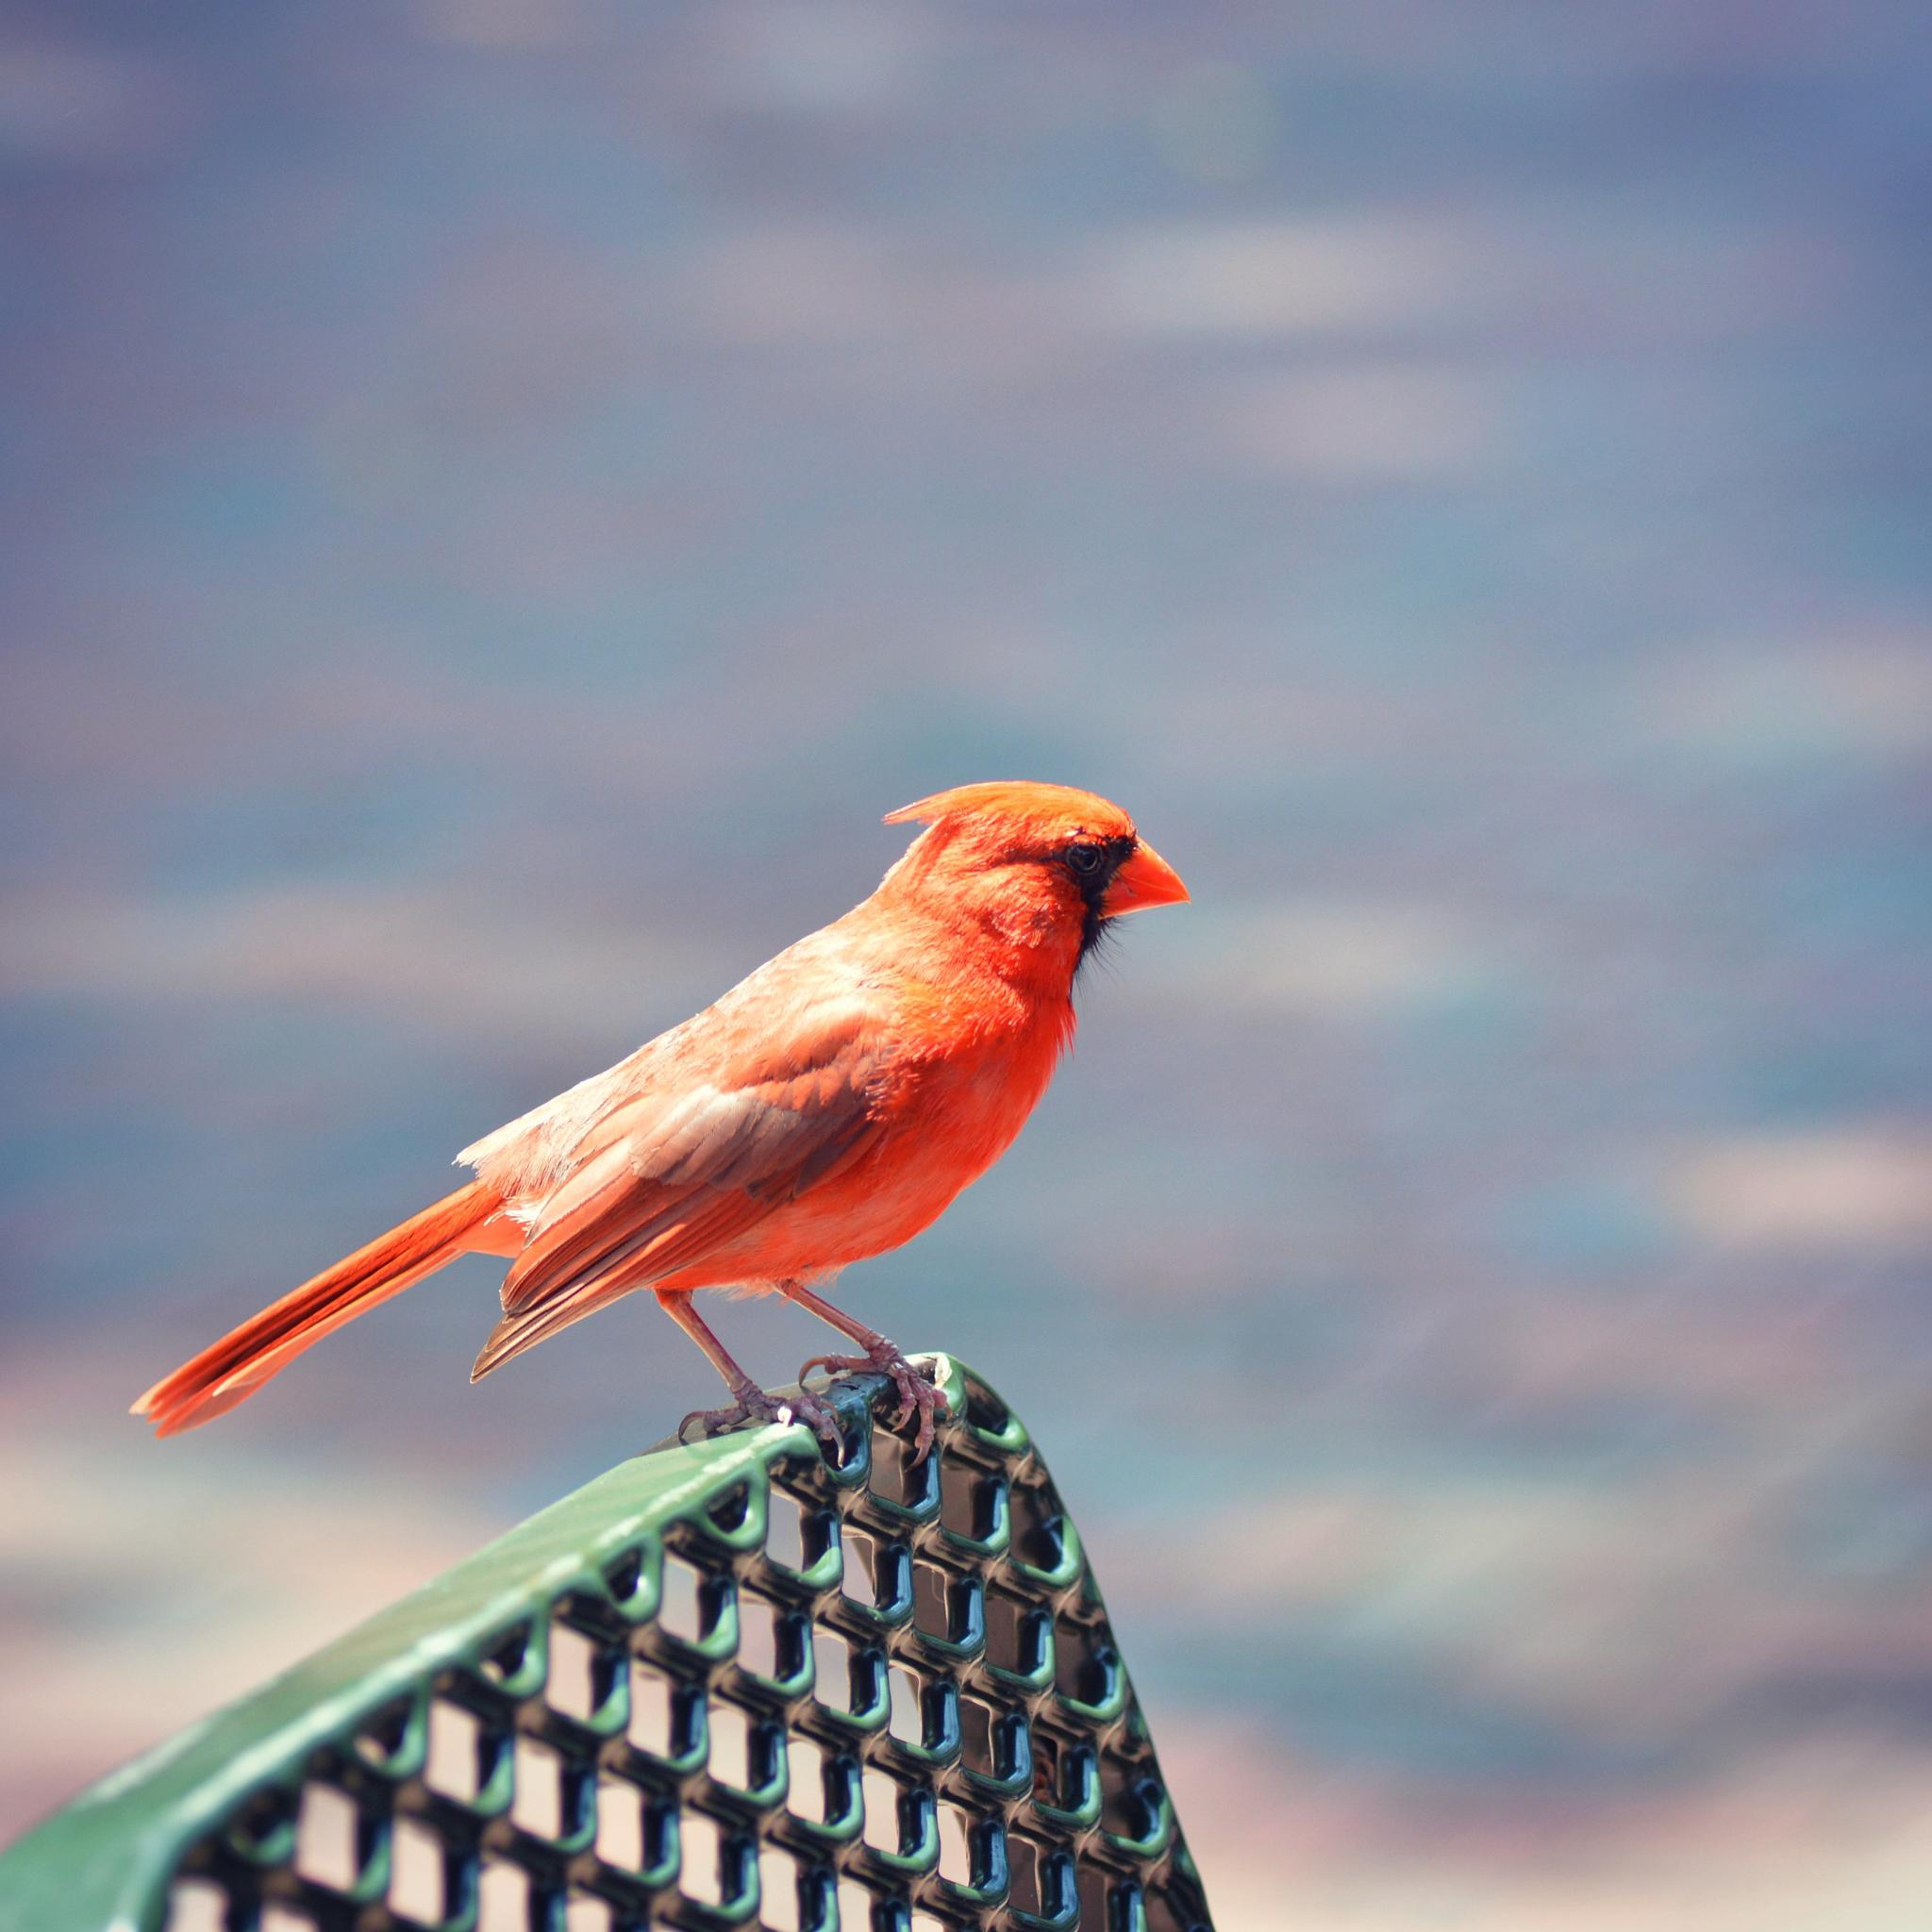 Perched Pretty by LittleHummingBirdPhotography